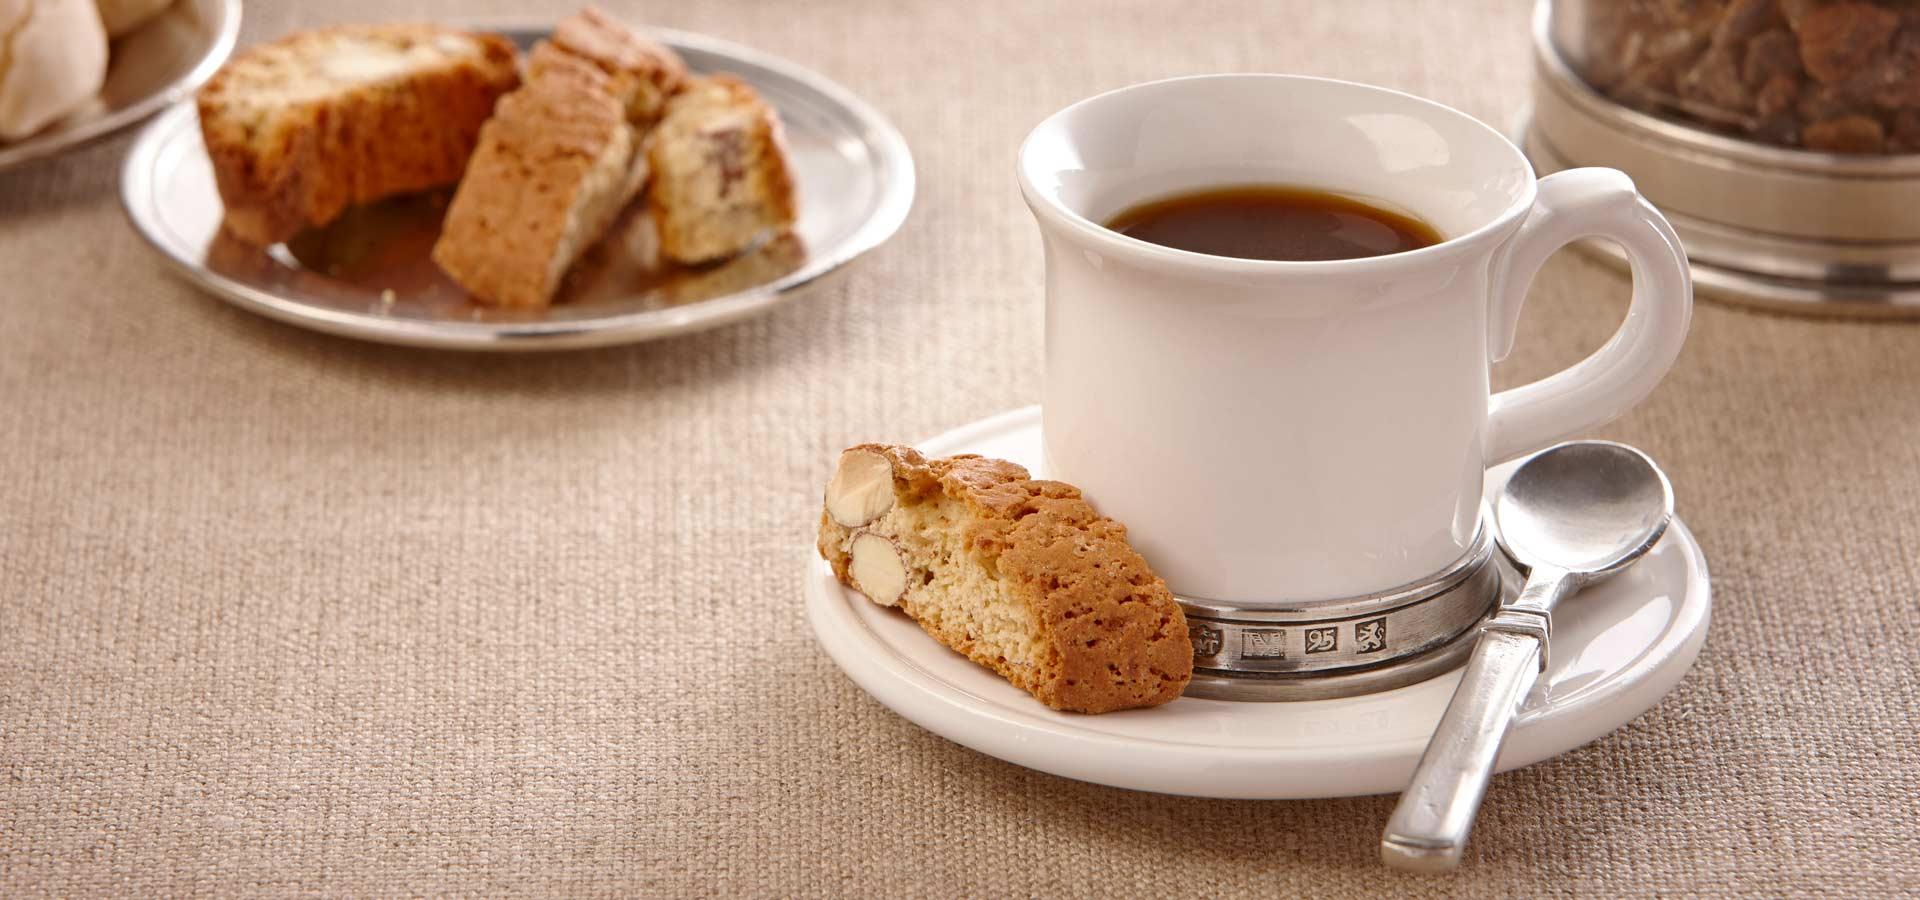 servizi tè e caffè